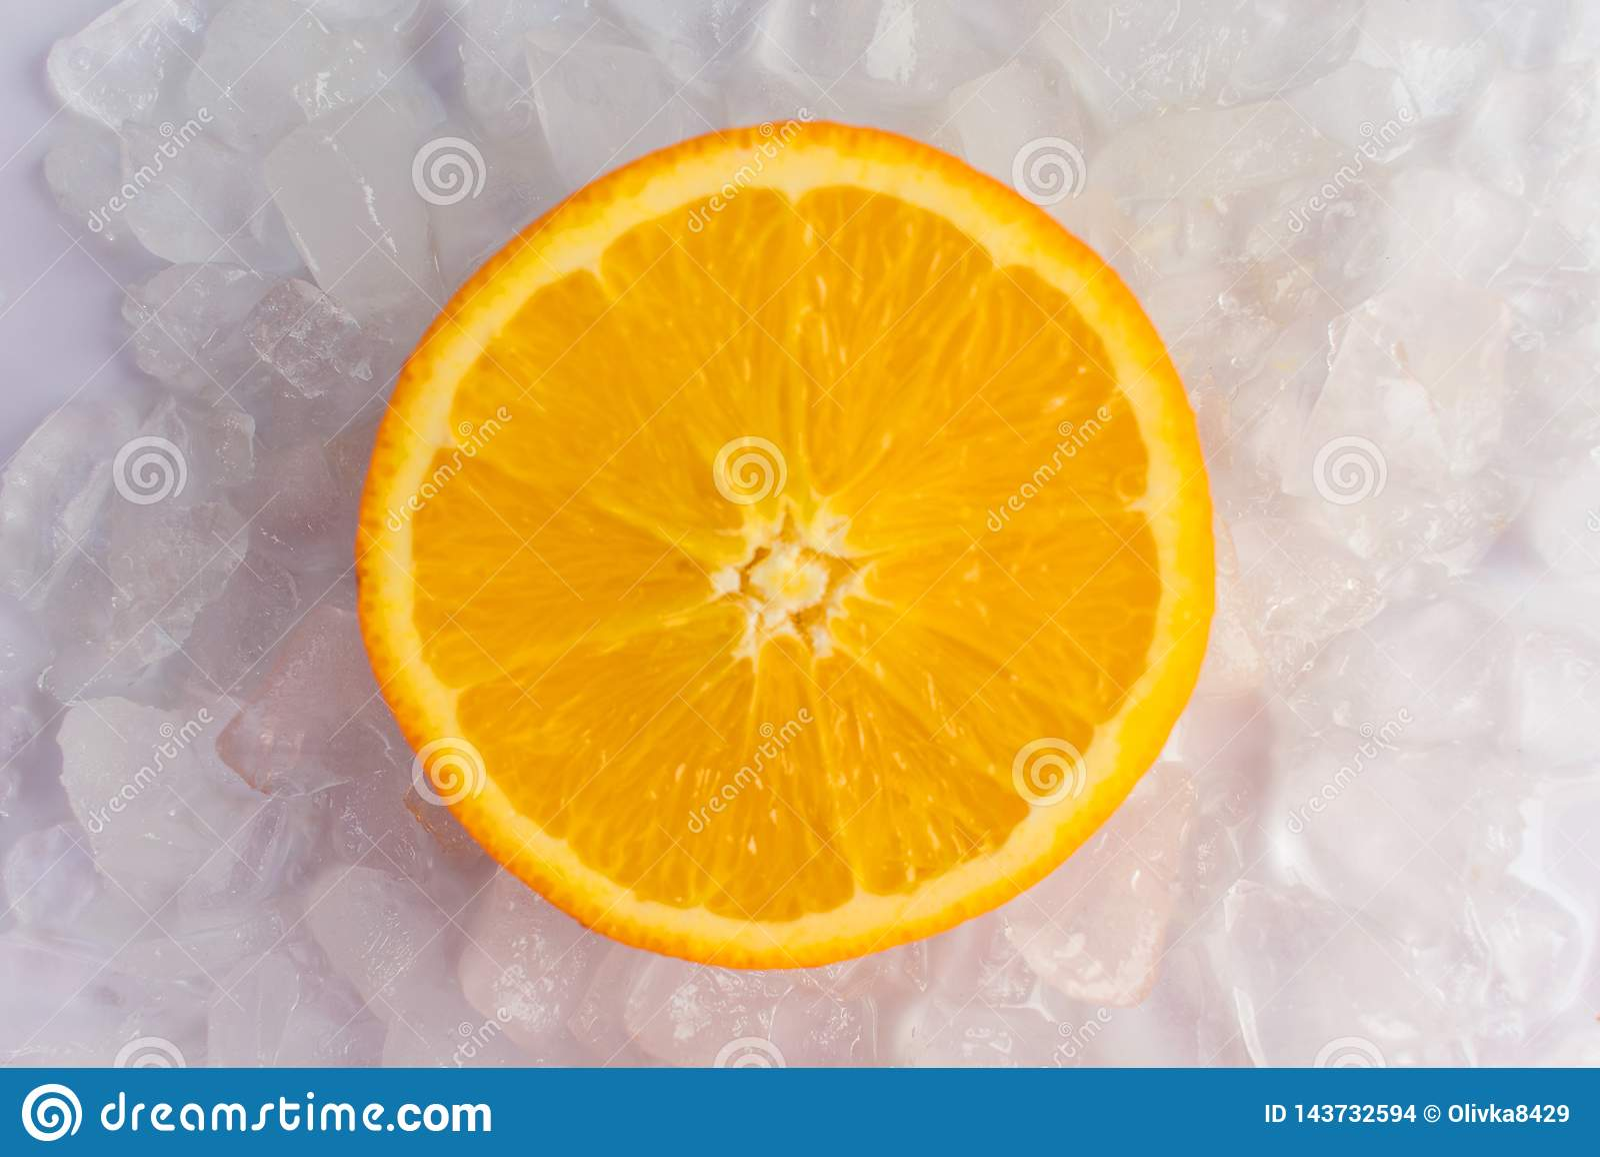 Orange slices are in the ice